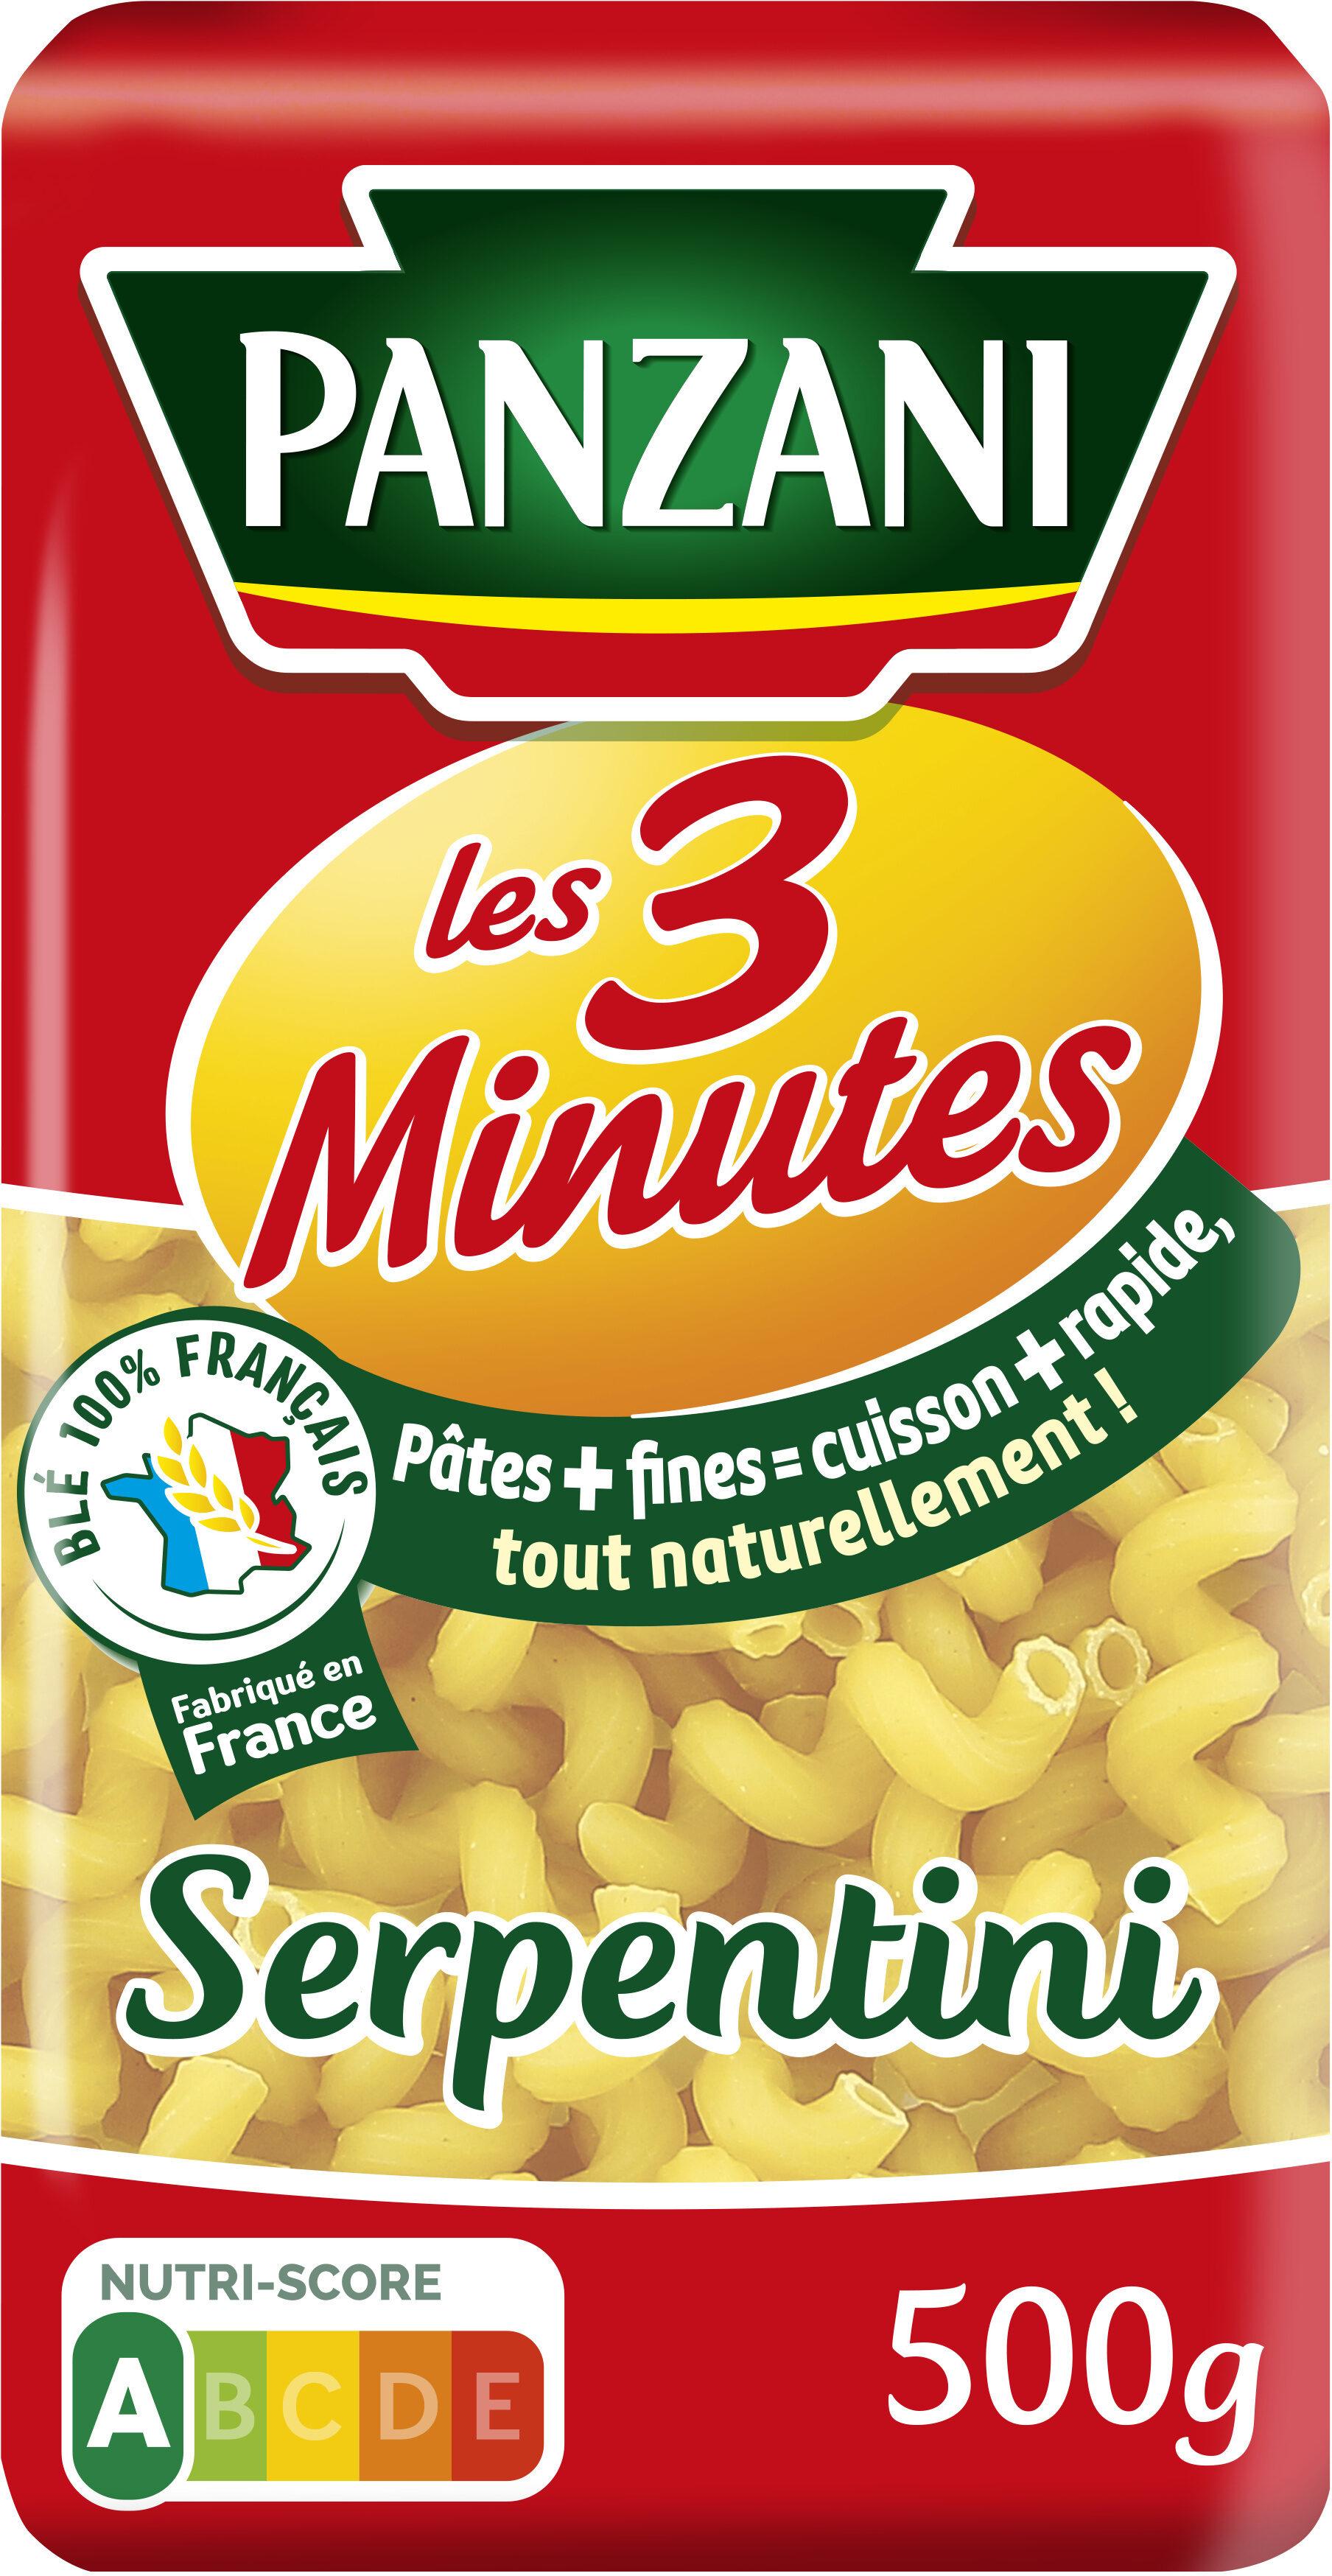 Panzani serpentini 3 minutes - Product - fr